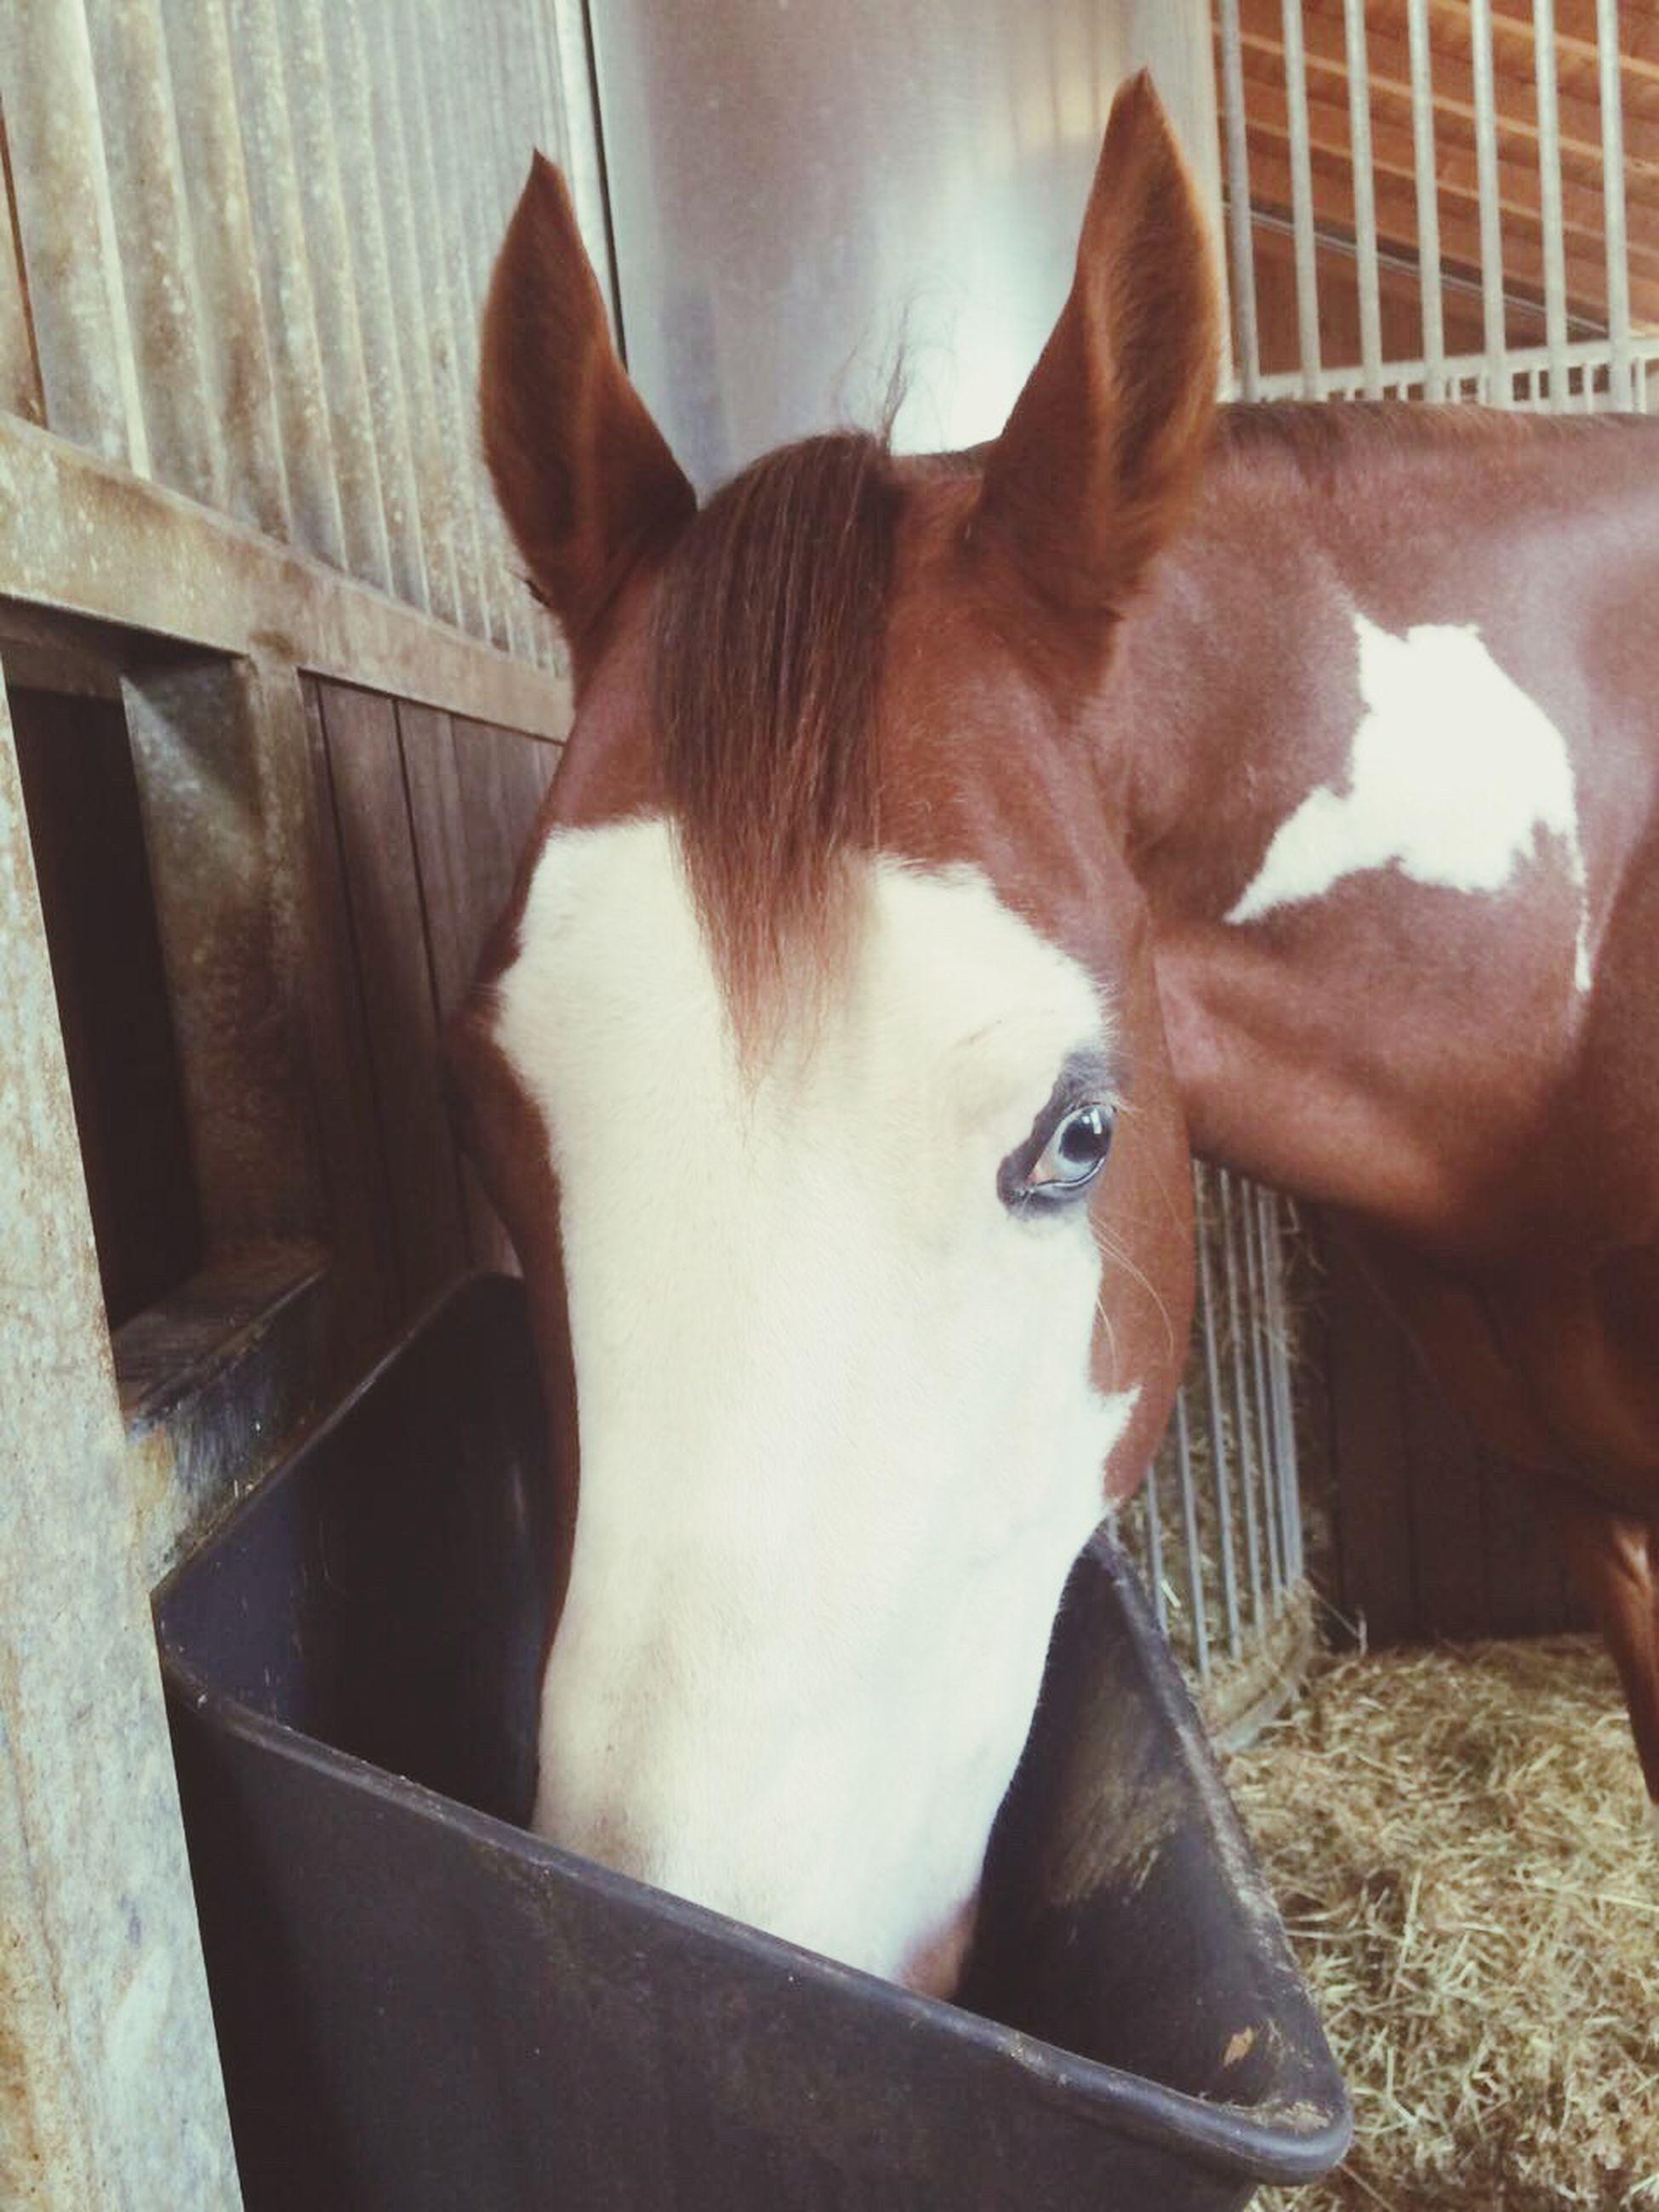 domestic animals, mammal, animal themes, one animal, pets, horse, animal head, no people, livestock, day, indoors, close-up